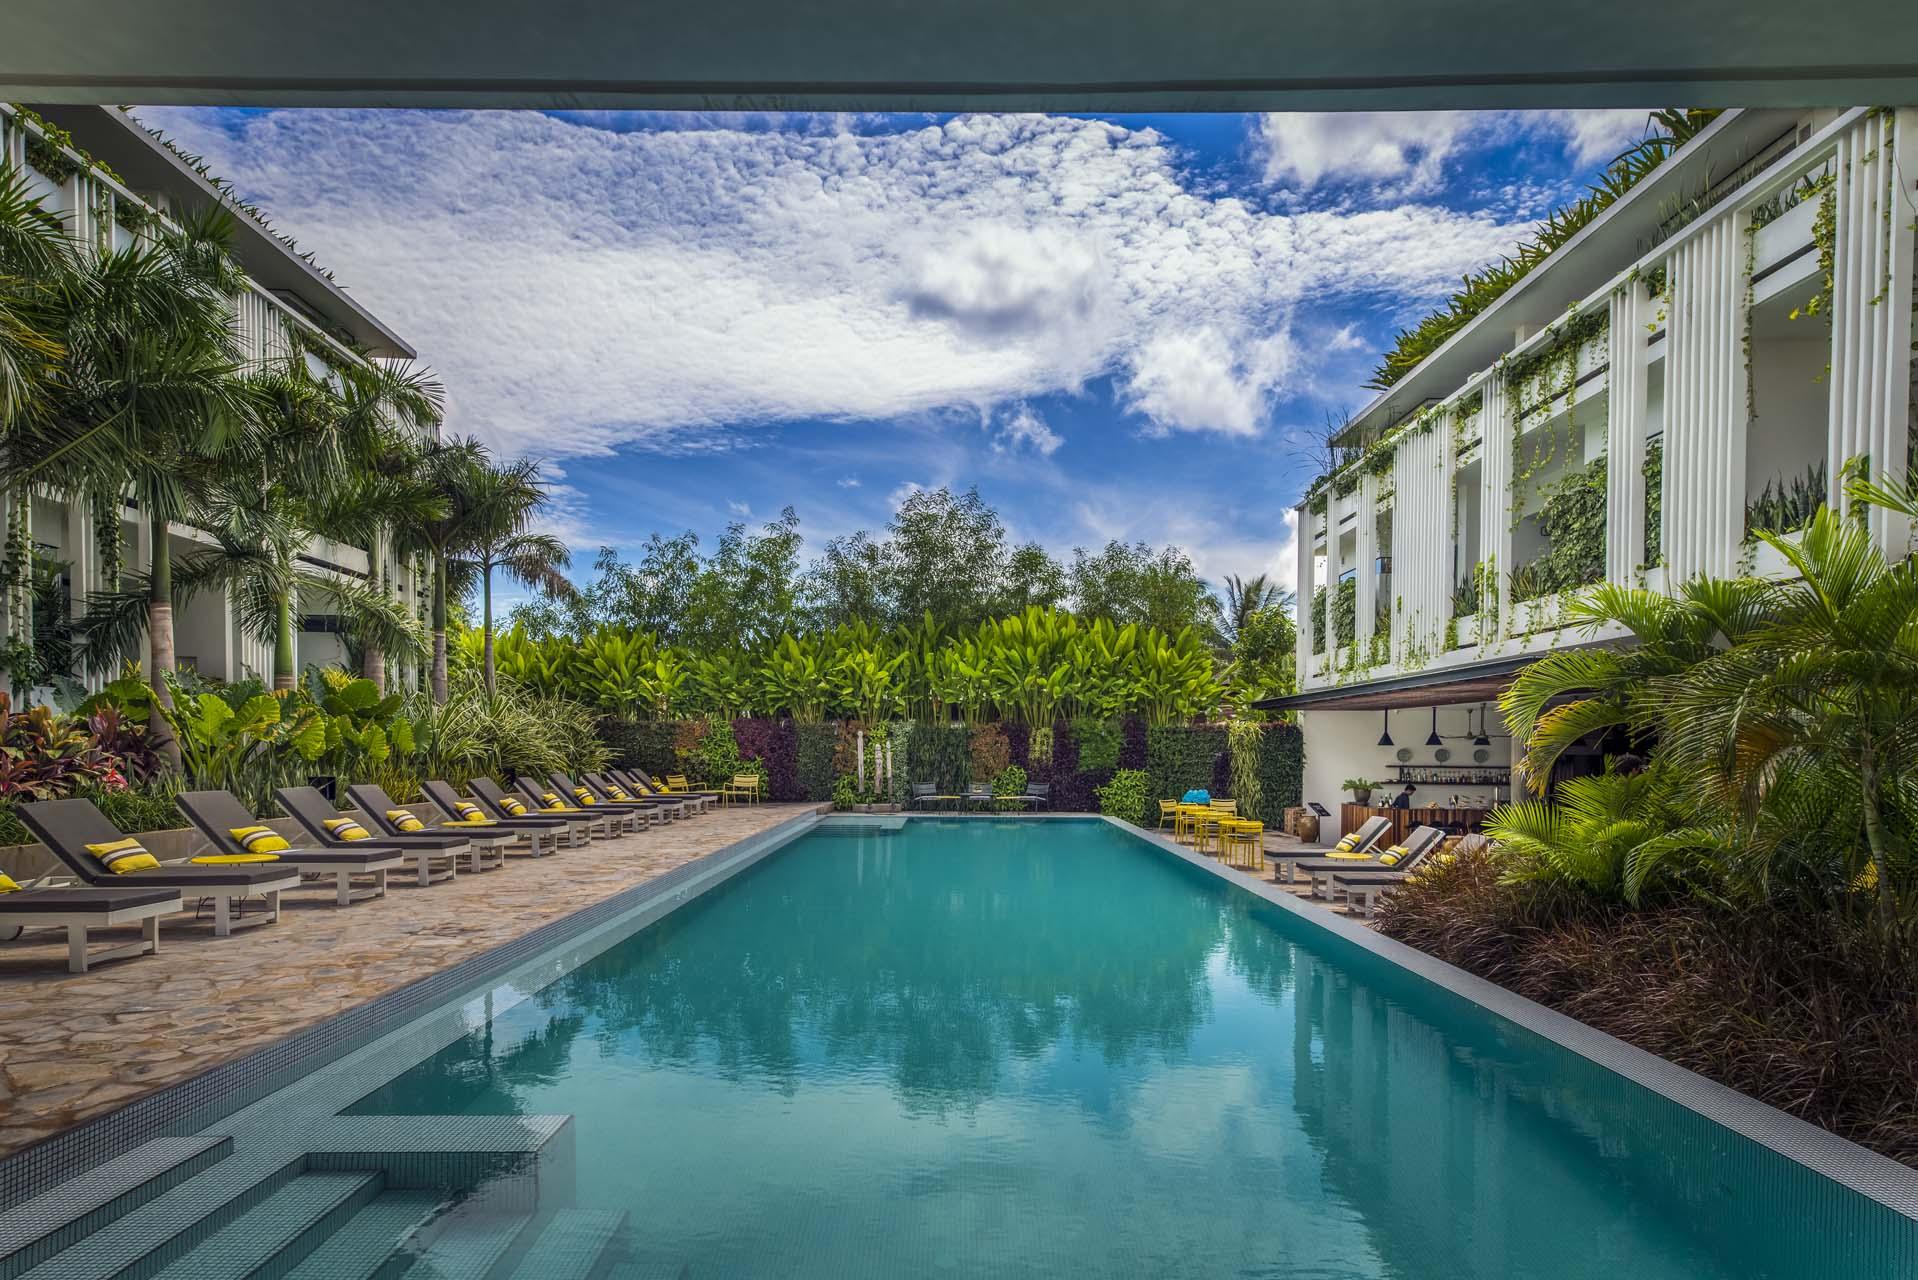 Viroth s hotel n 1 top hotel in the world 2018 - Stadium swimming pool bloemfontein prices ...